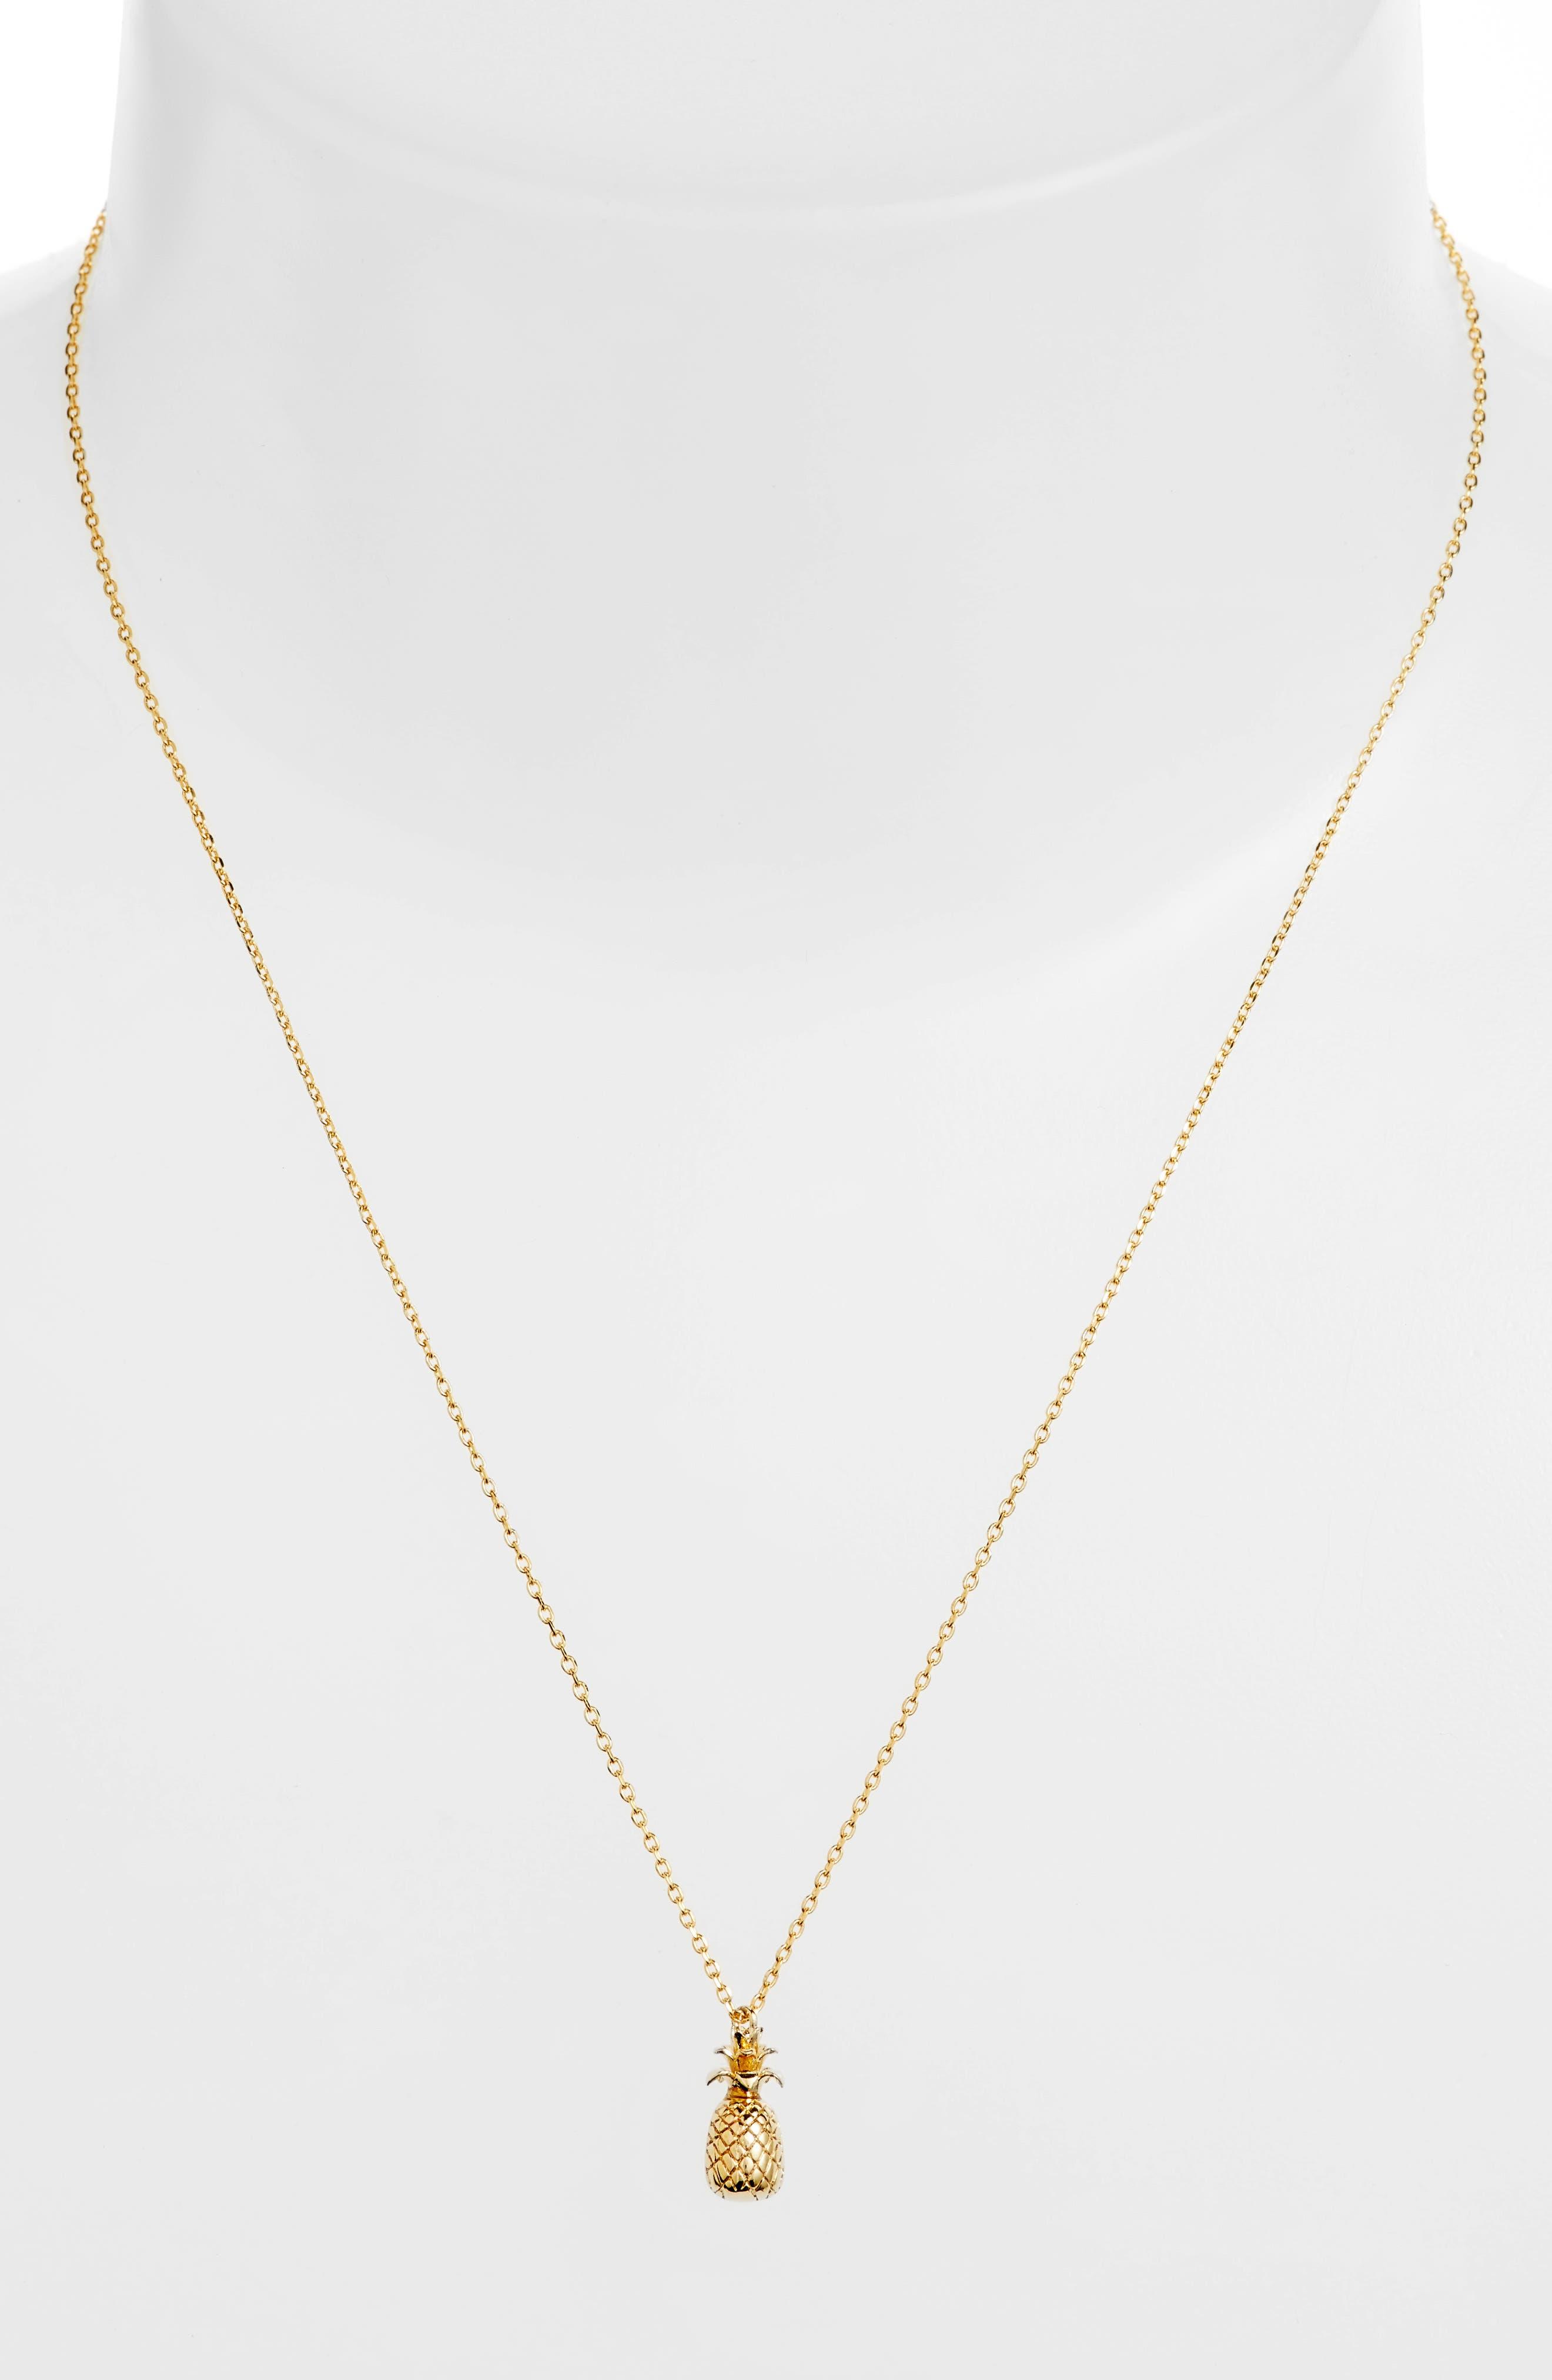 Treasure Me Pineapple Pendant Necklace,                             Alternate thumbnail 2, color,                             710